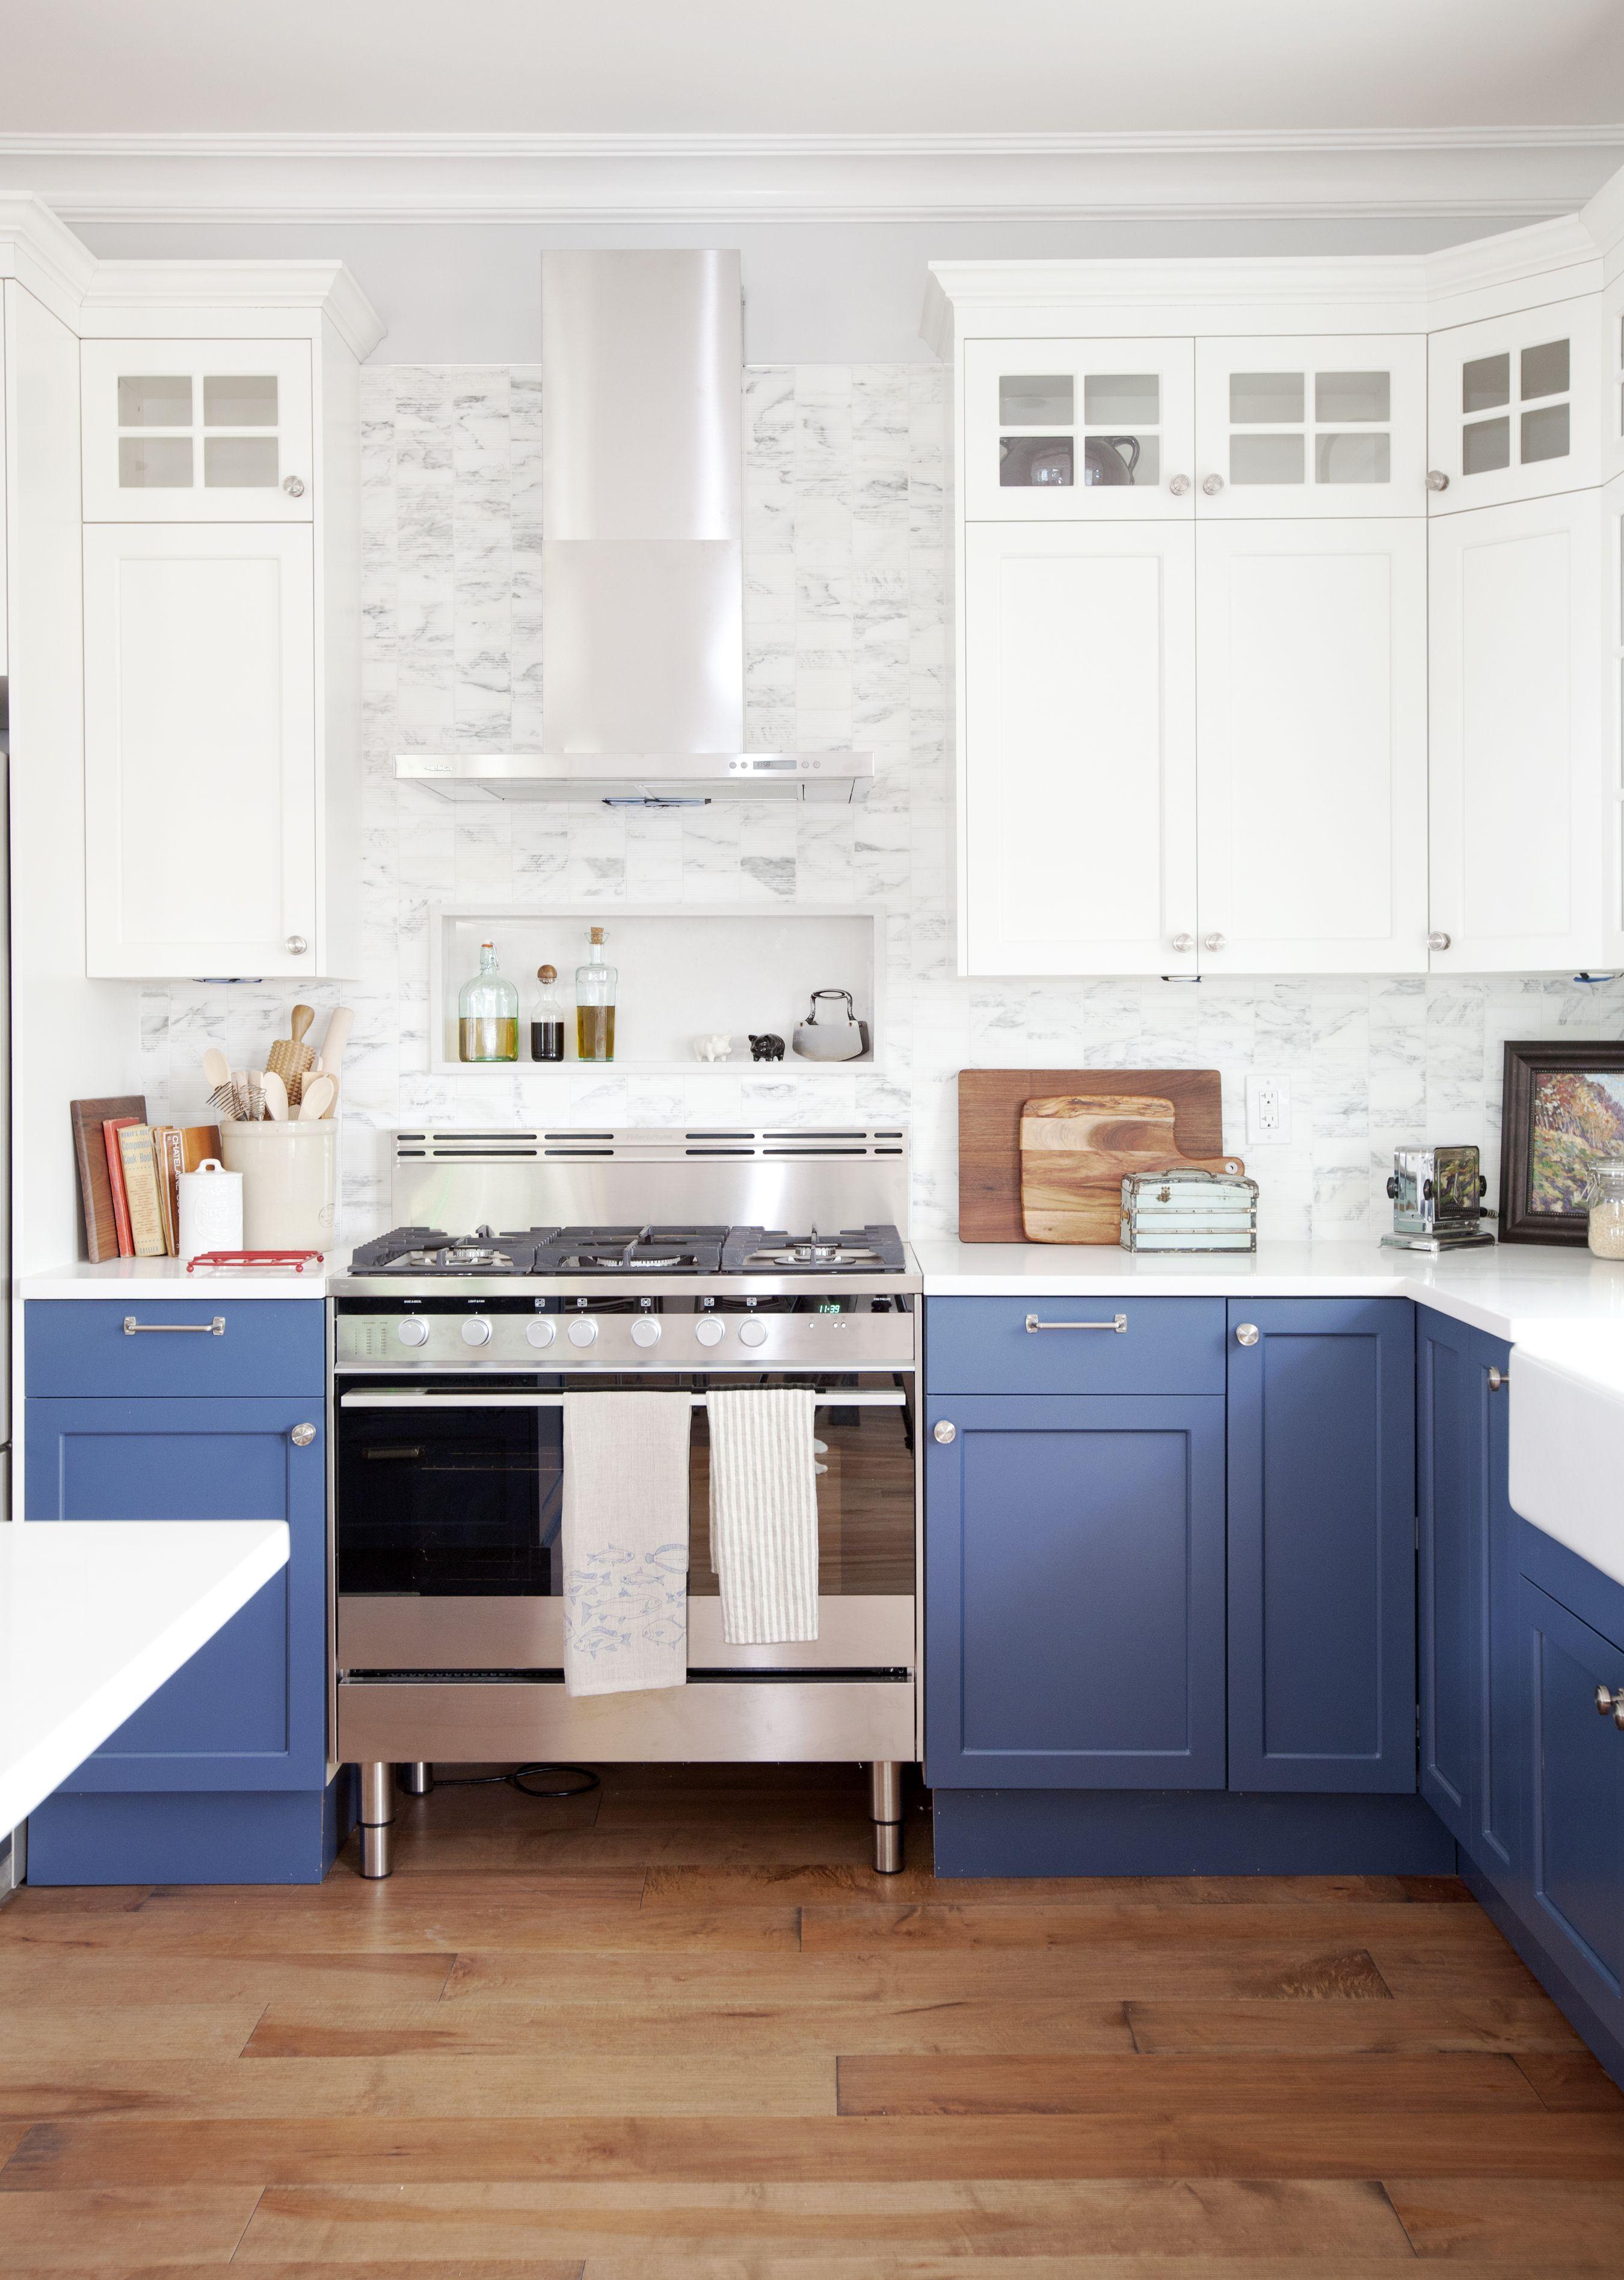 Kitchen Backsplash Vancouver world mosaic tile | gallery | tiles vancouver, mosaic tiles